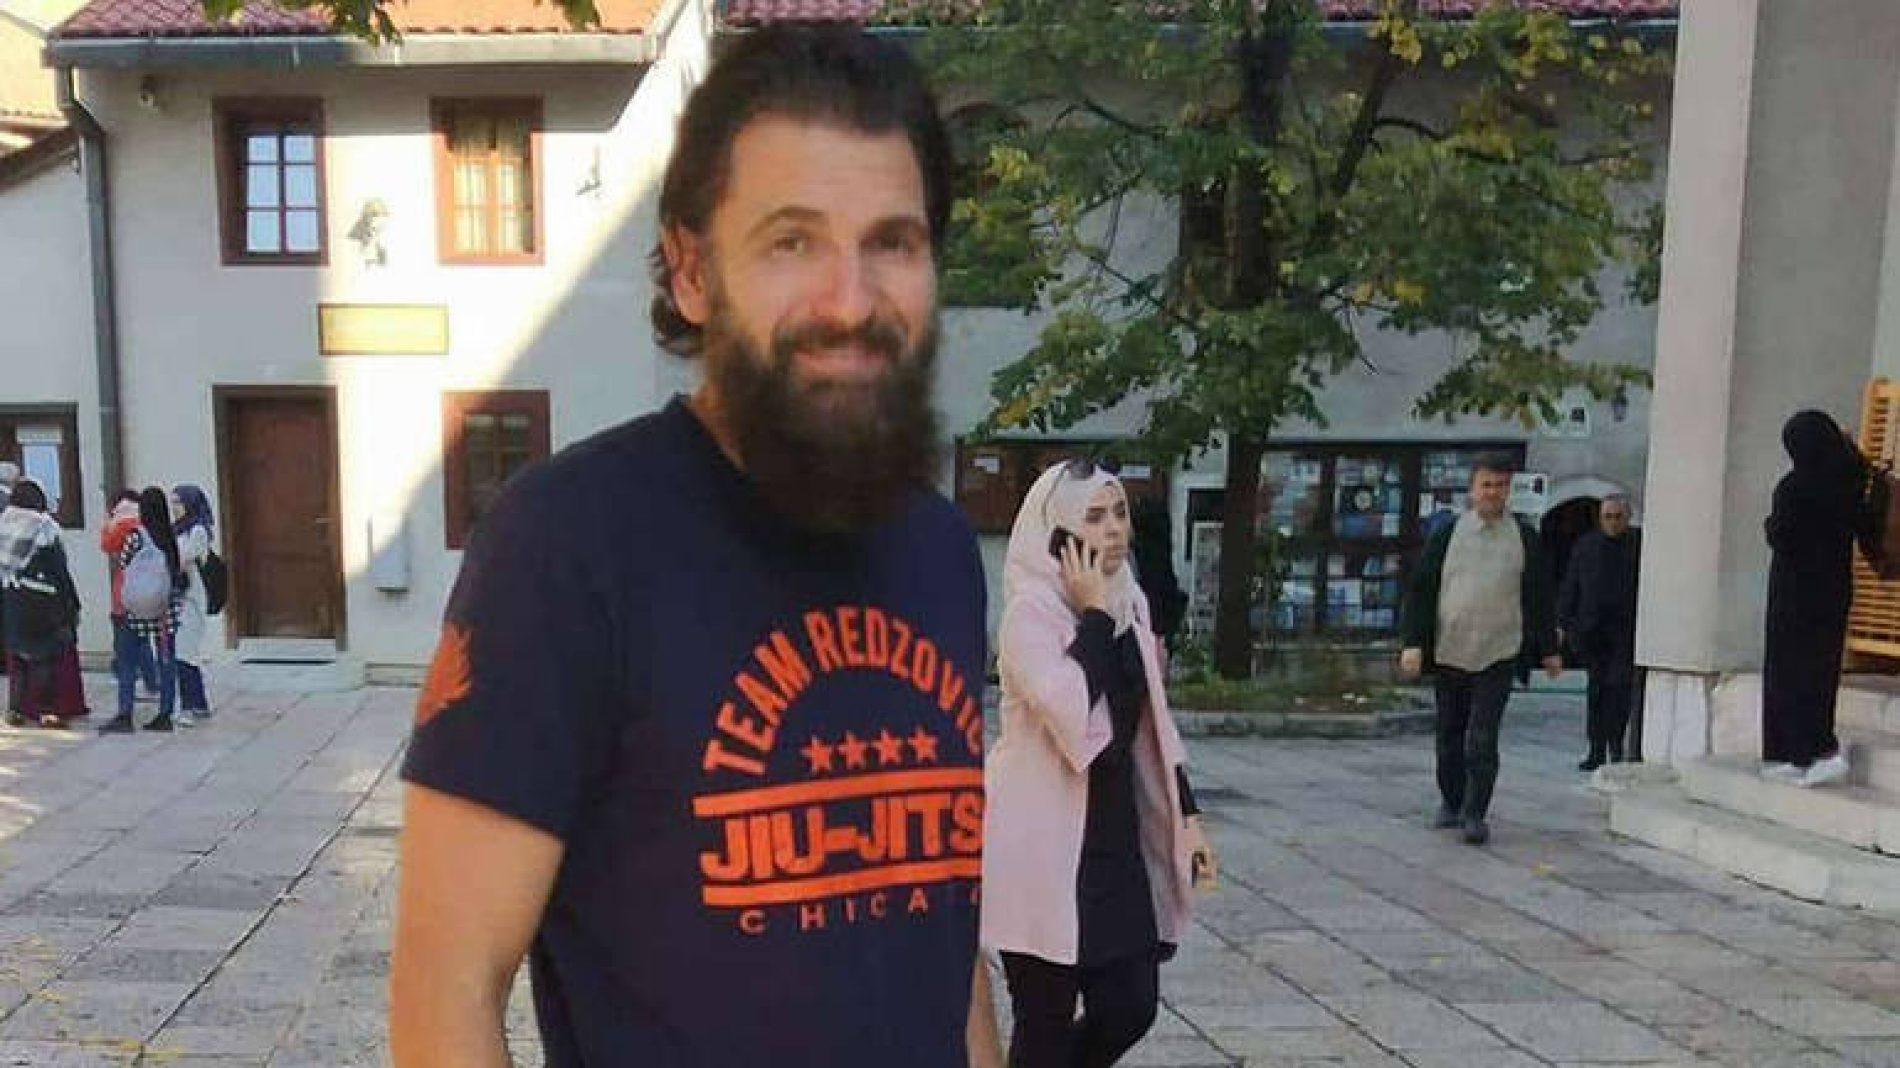 Eddie Redžović ruši predrasude o muslimanima